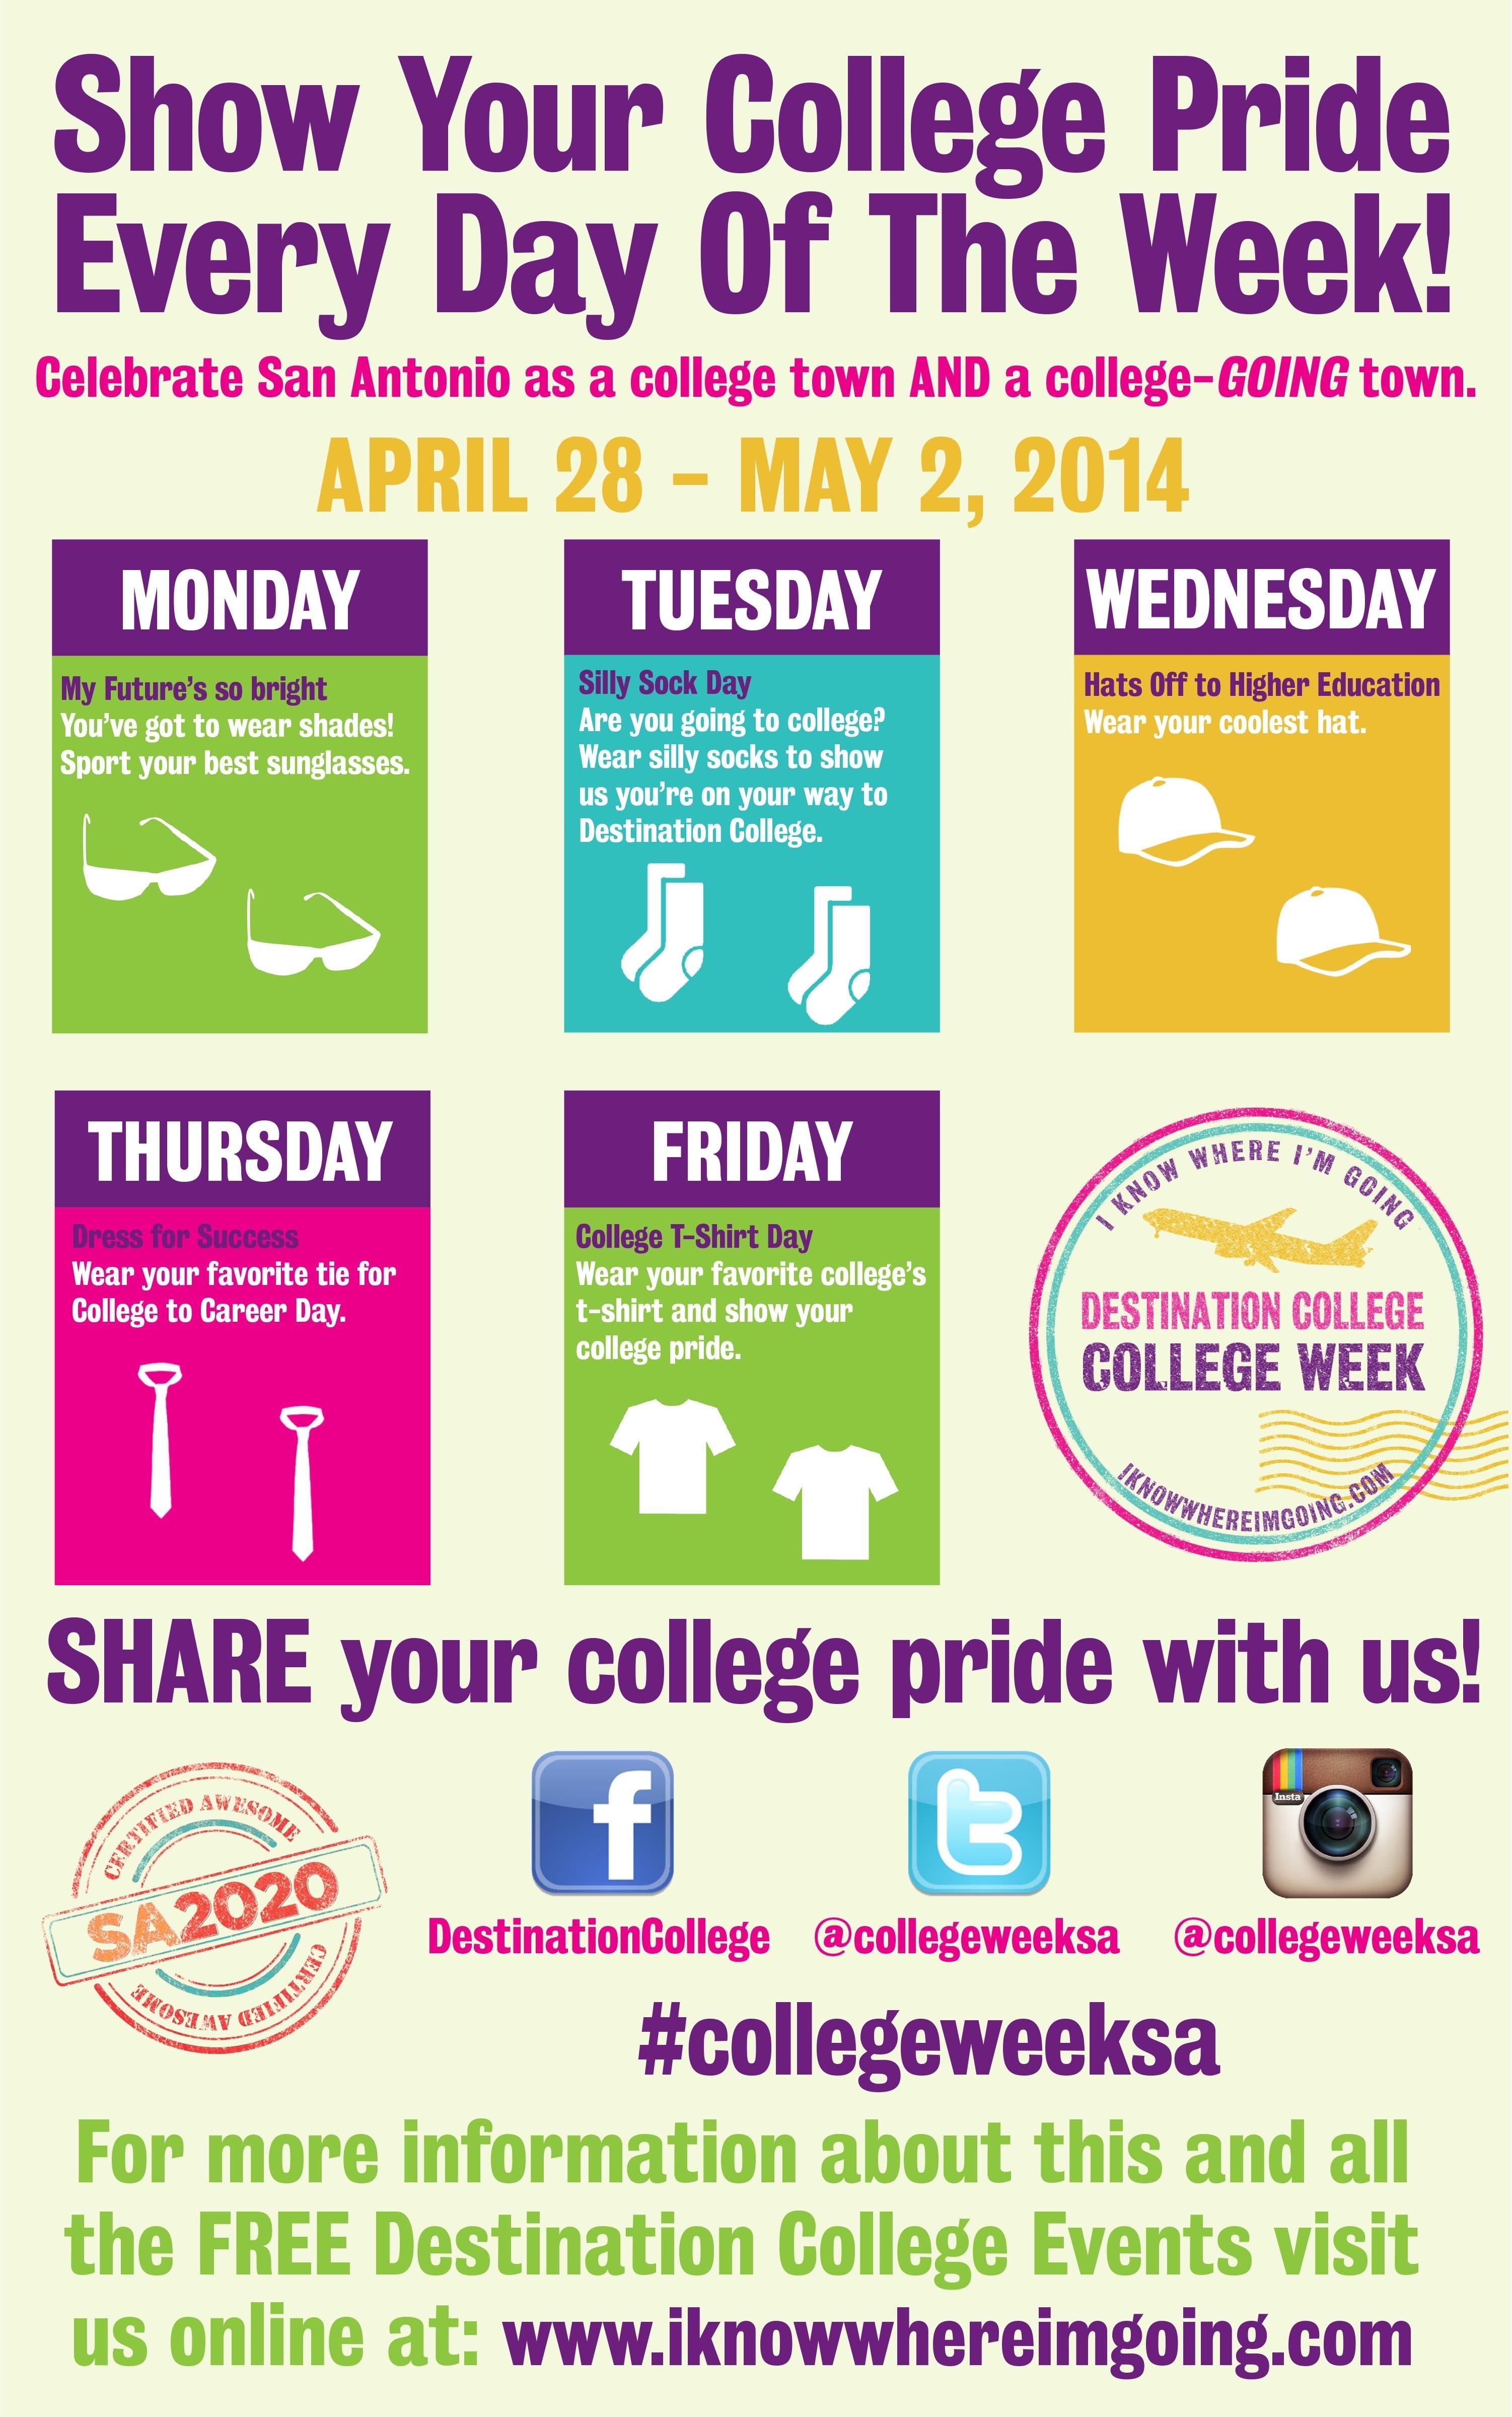 10 Most Recommended Spirit Week Ideas For Elementary School dc2014 spirit week eastside promise neighborhood 2020